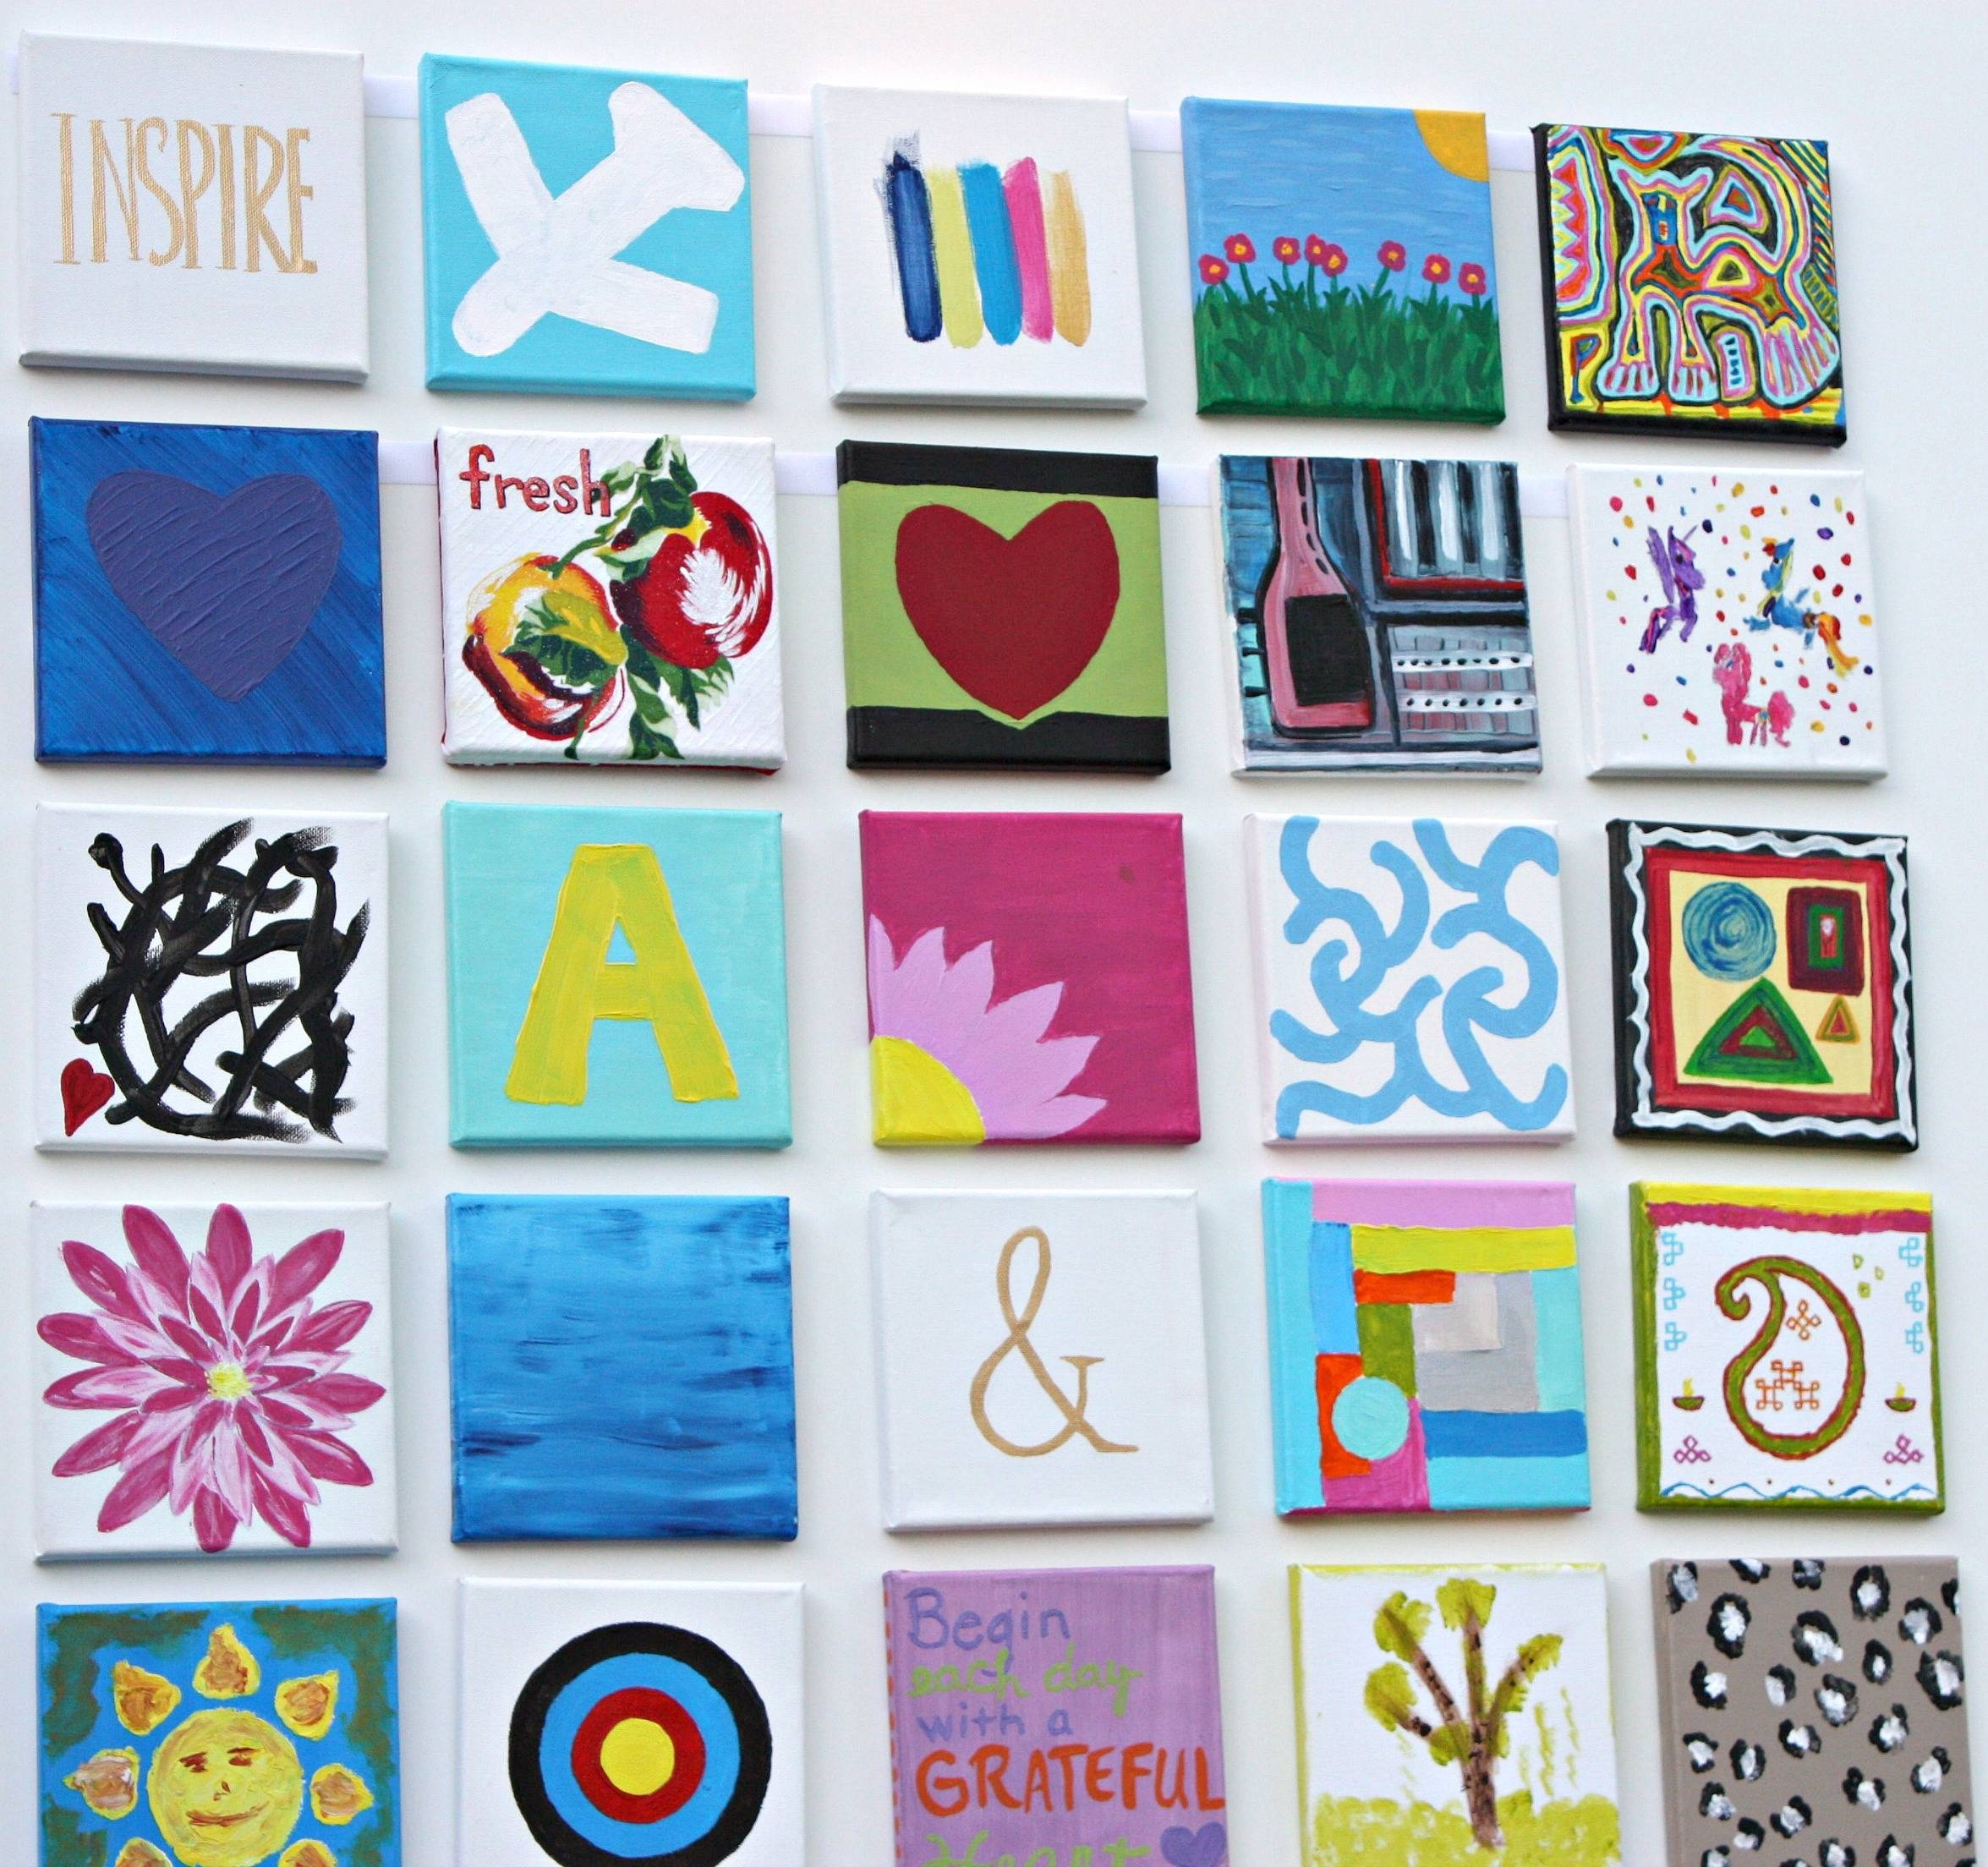 Wall Art Designs: Small Canvas Wall Art Ideas Small Artwork, Small Throughout Newest Small Canvas Wall Art (View 1 of 20)